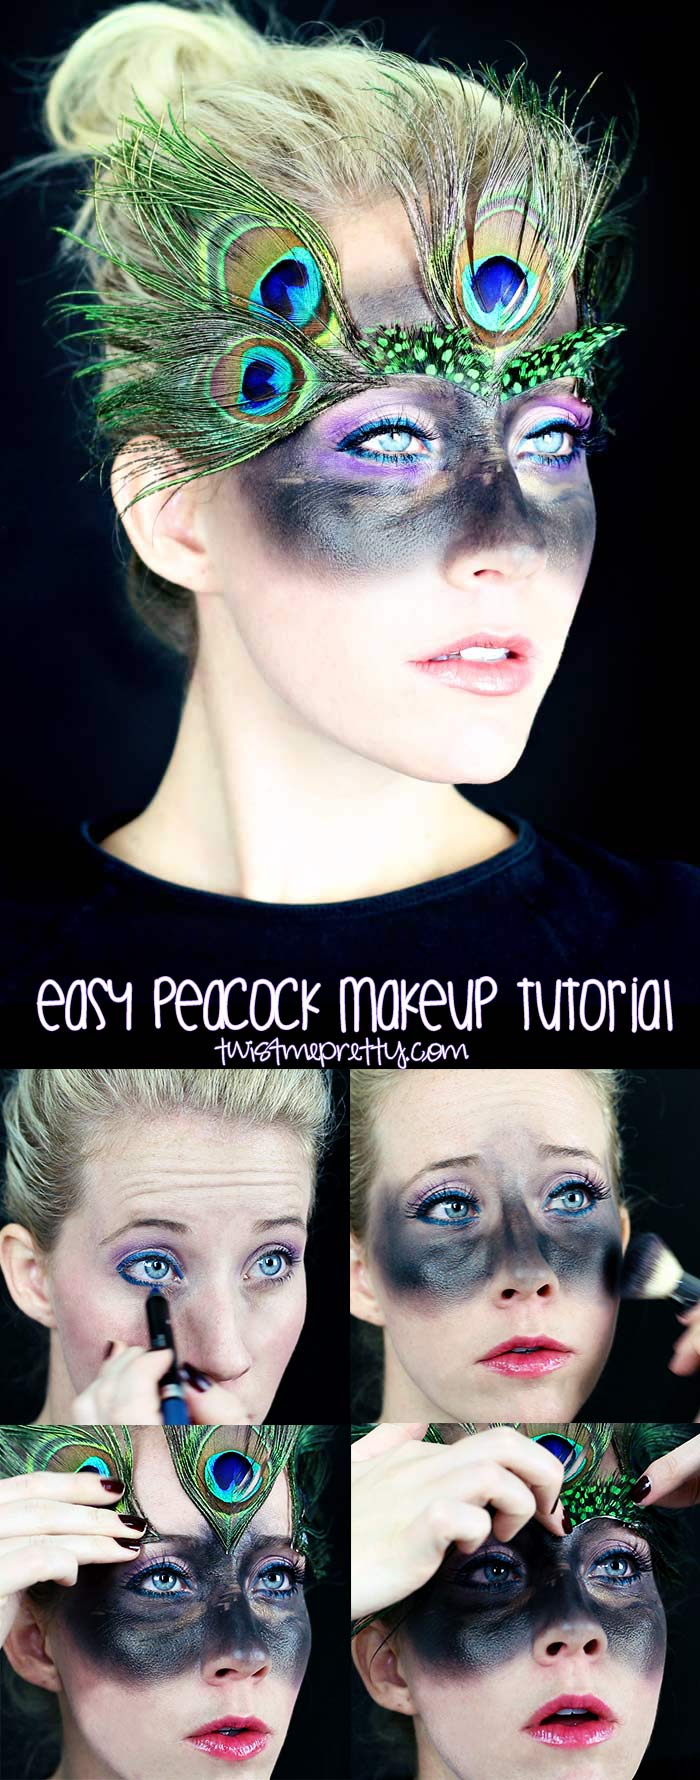 easy peacock makeup tutorial